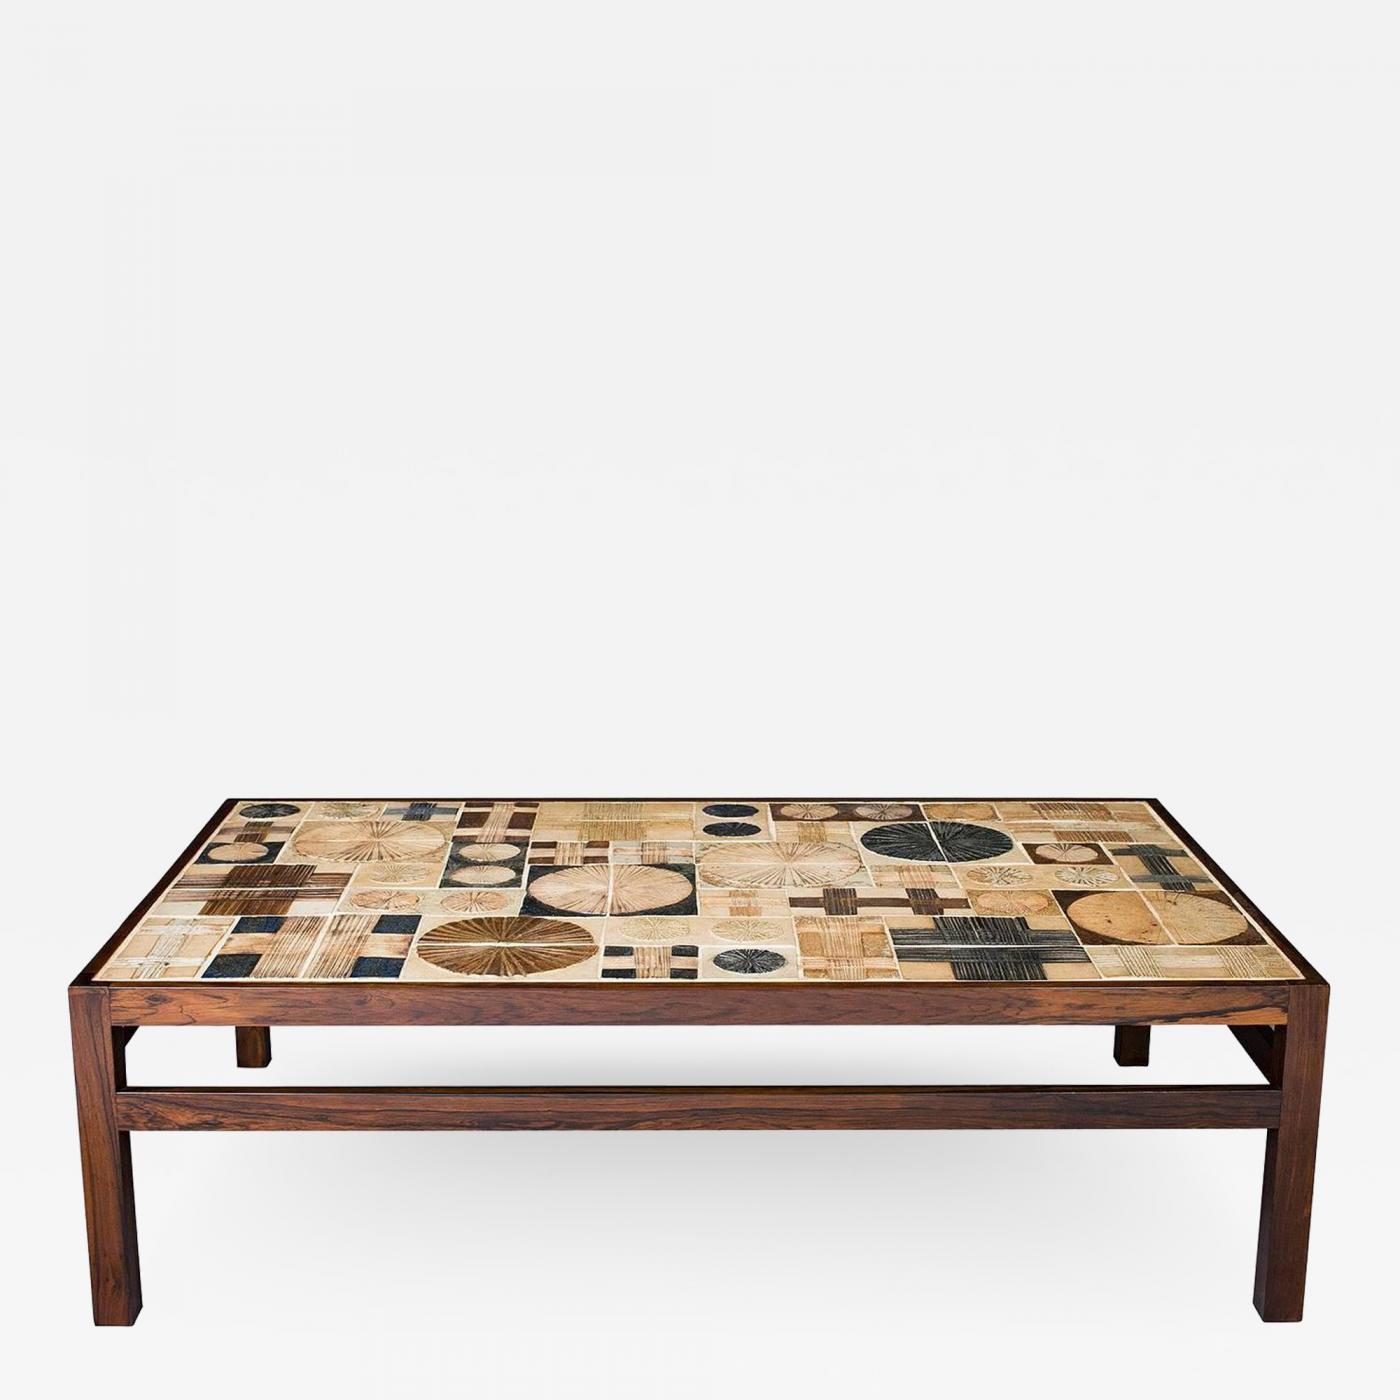 Tue Poulsen Tue Poulsen Tile Coffee Table